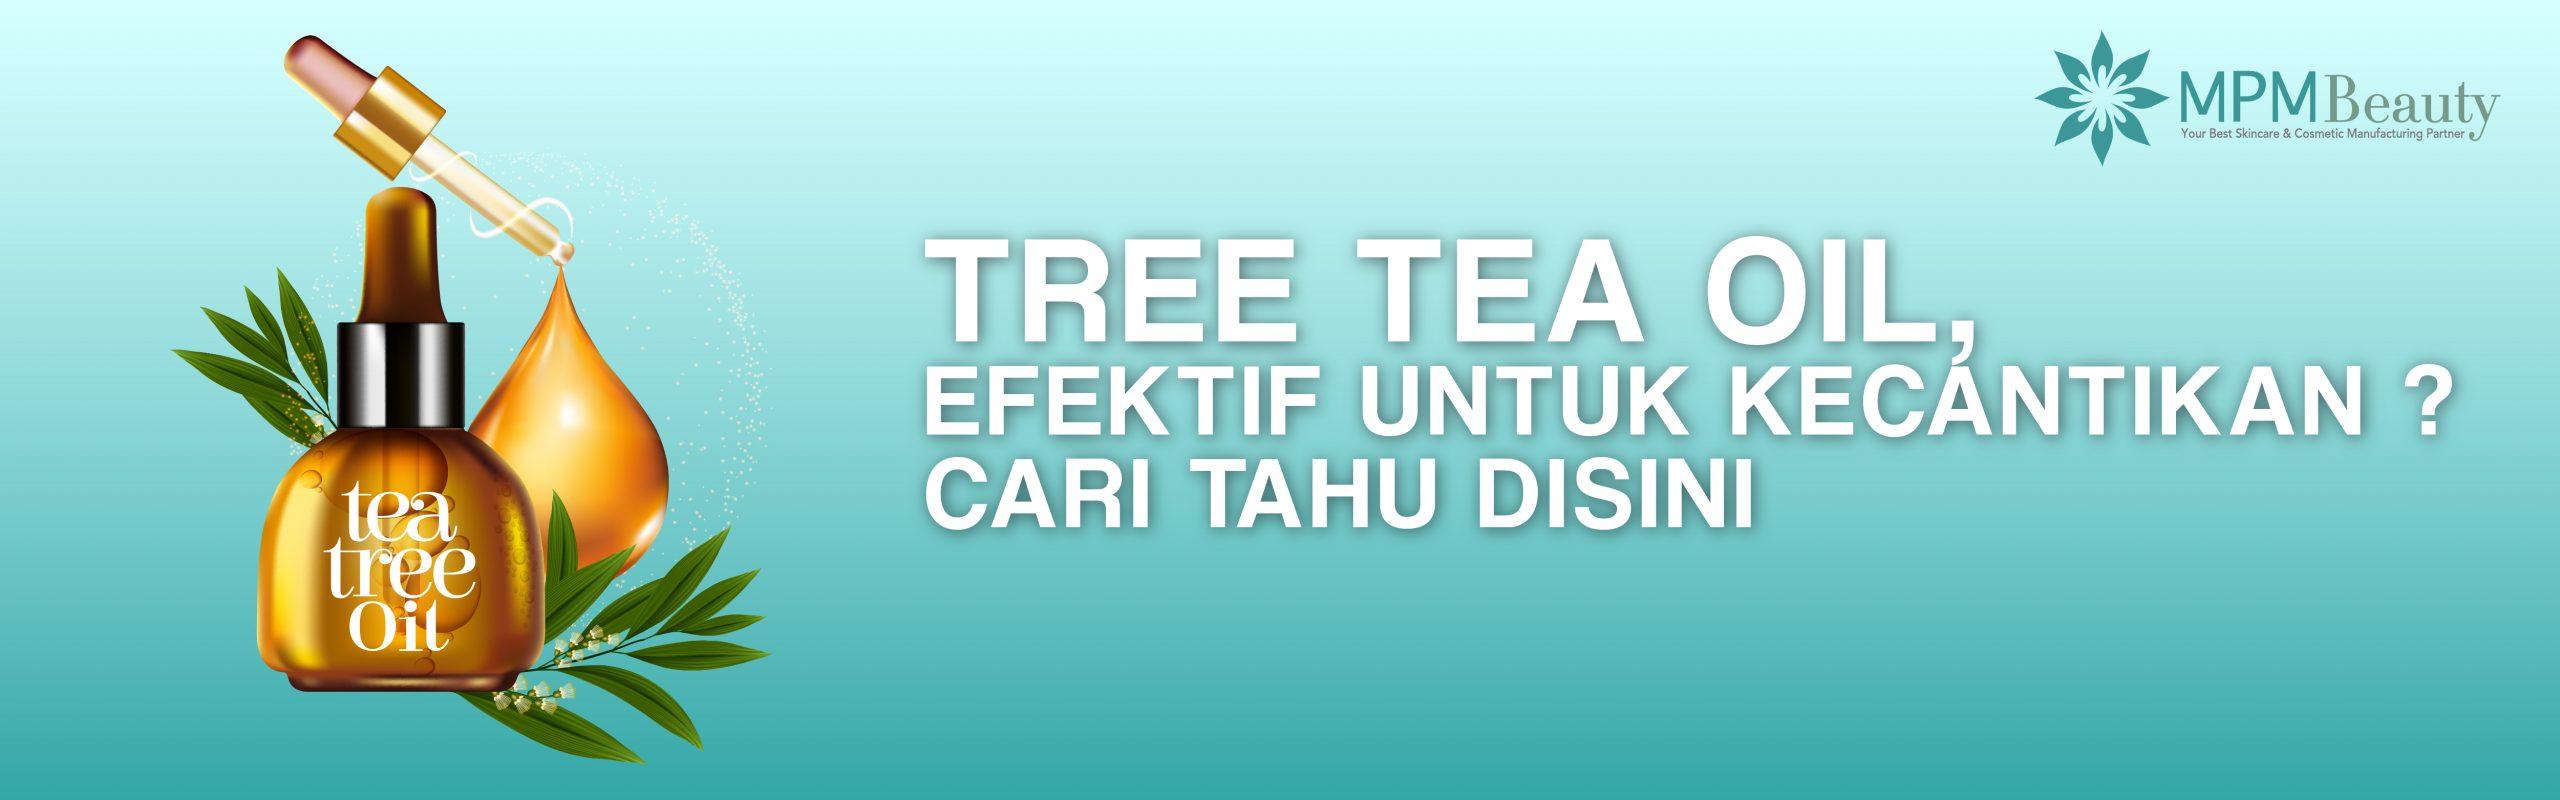 Tree Tea Oil, Efektif Untuk Kecantikan ? Cari Tahu disini